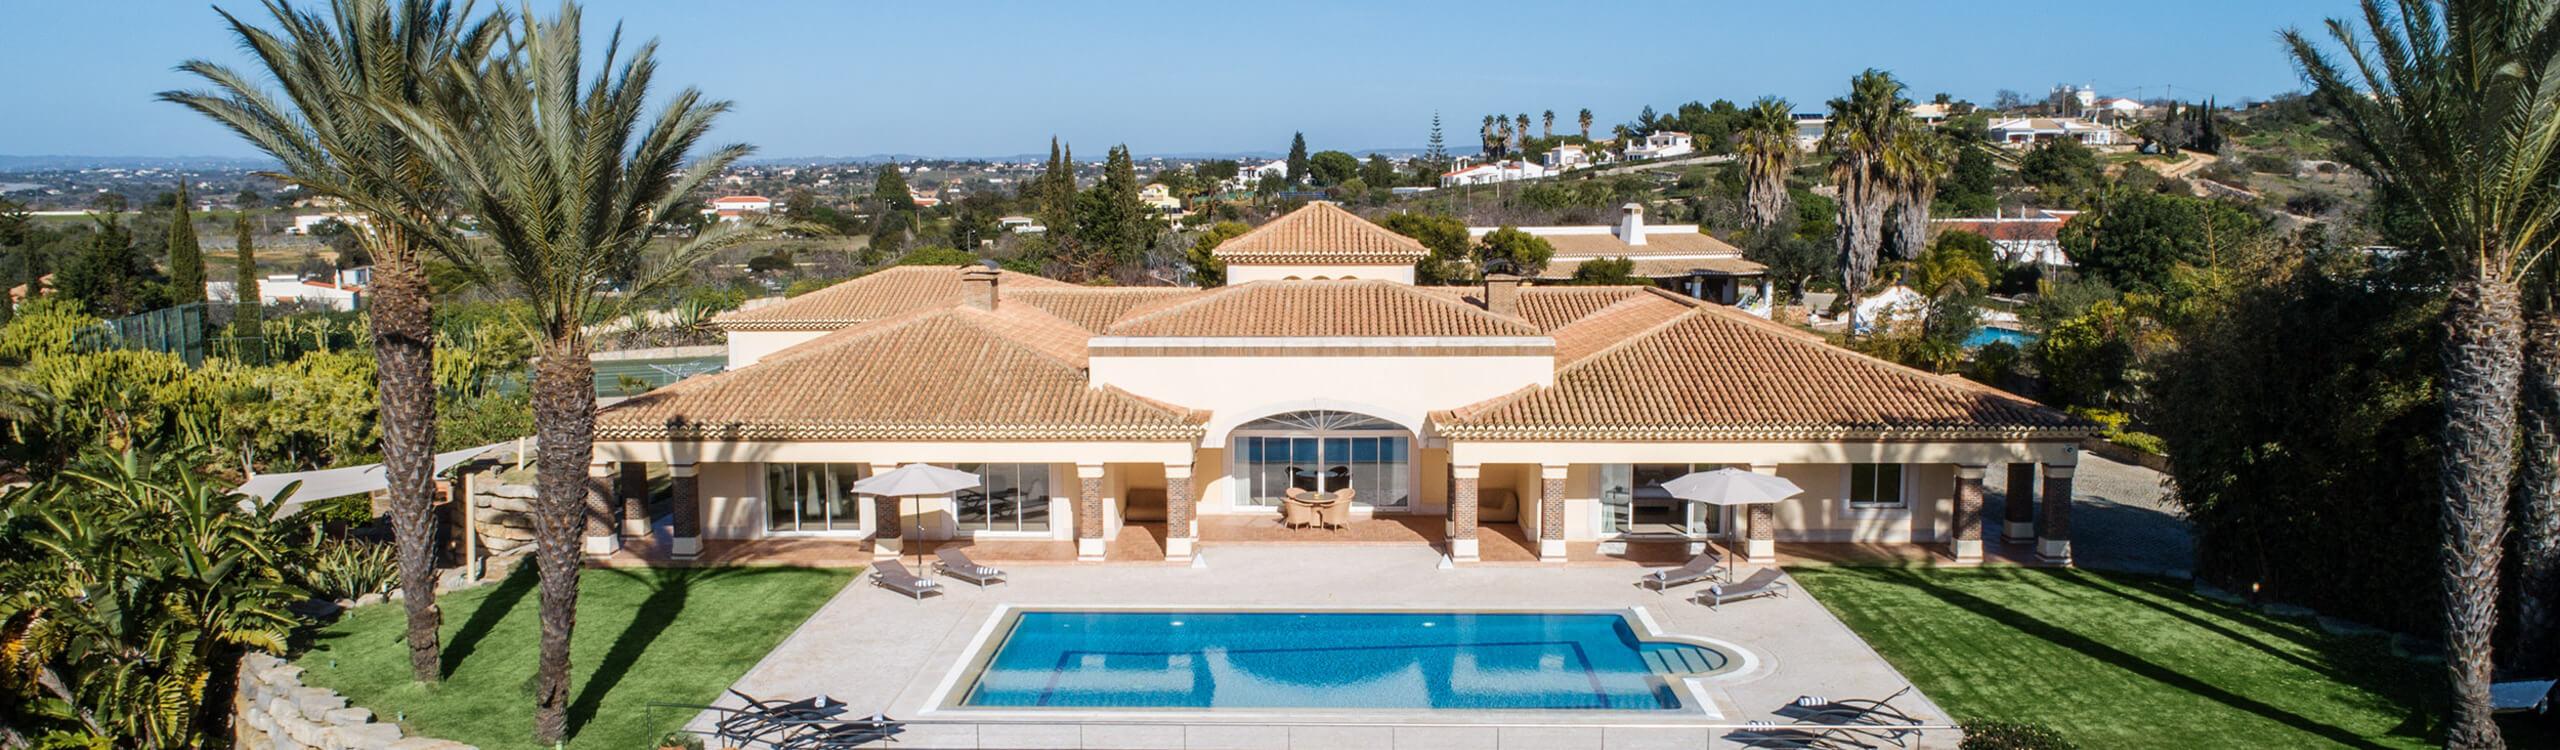 Private Villas In Portugal algarve villa | rent luxury villa carvoeiro